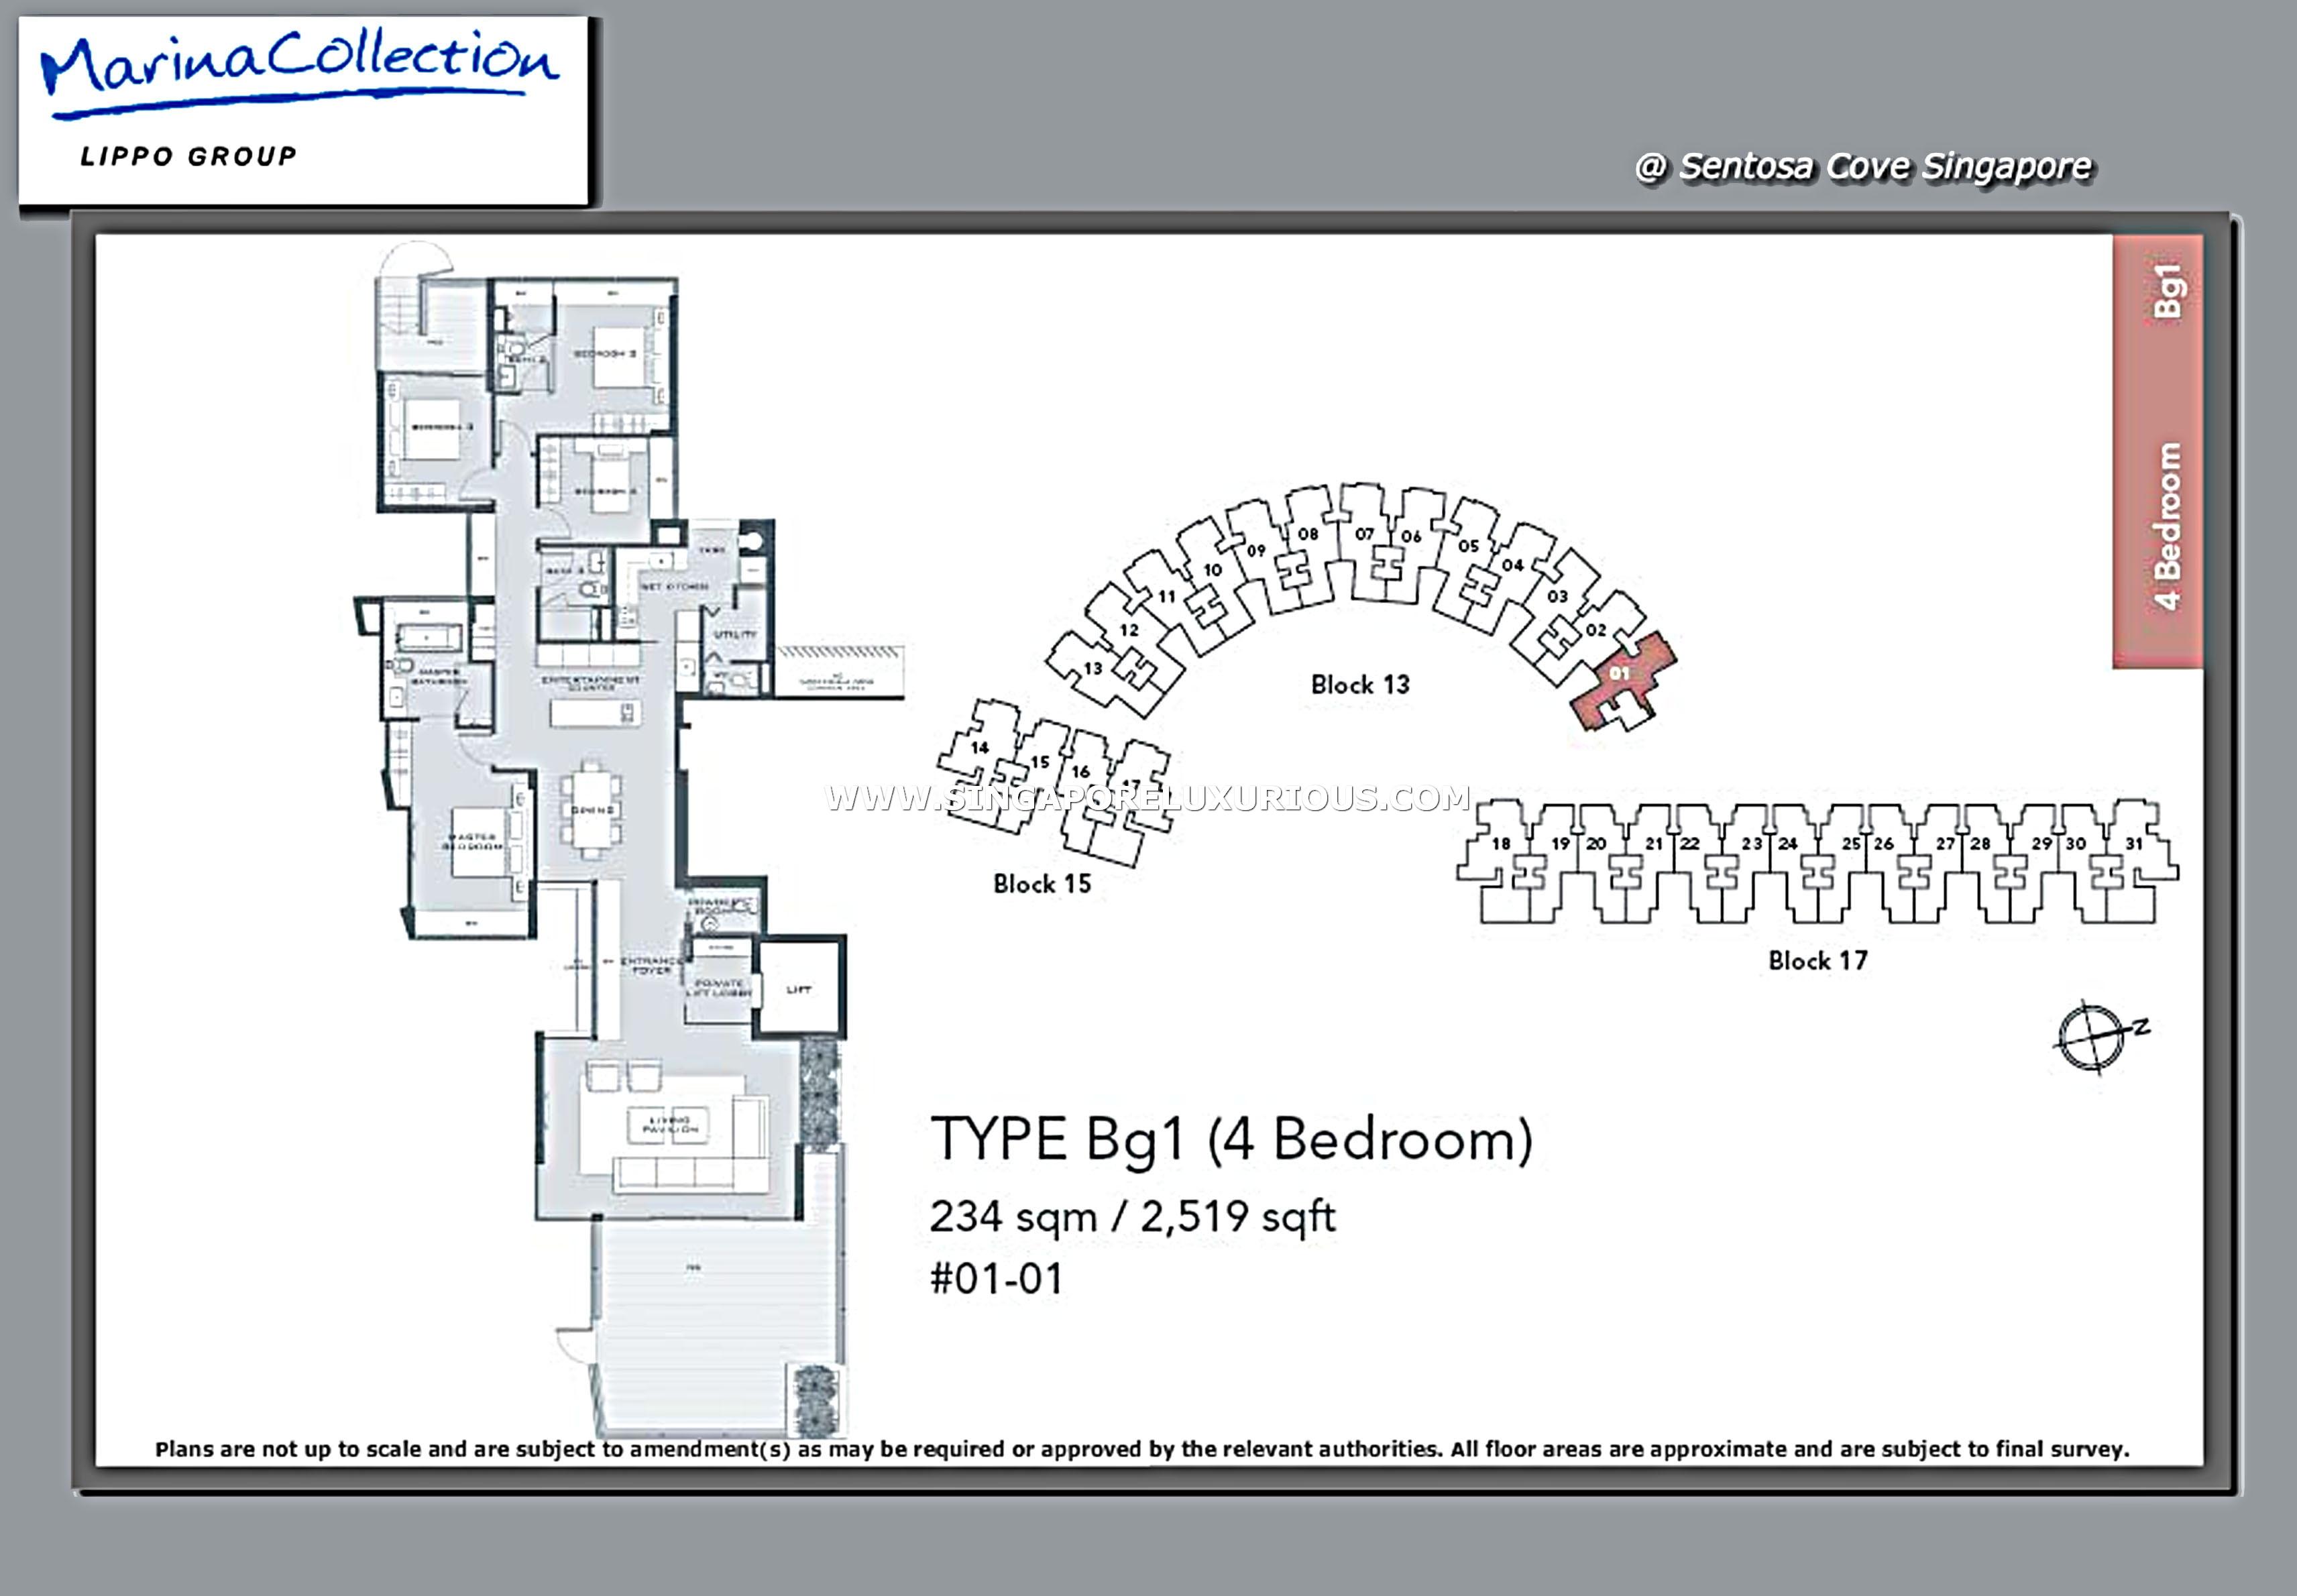 Marina Collection Site Amp Floor Plan Singapore Luxurious Property